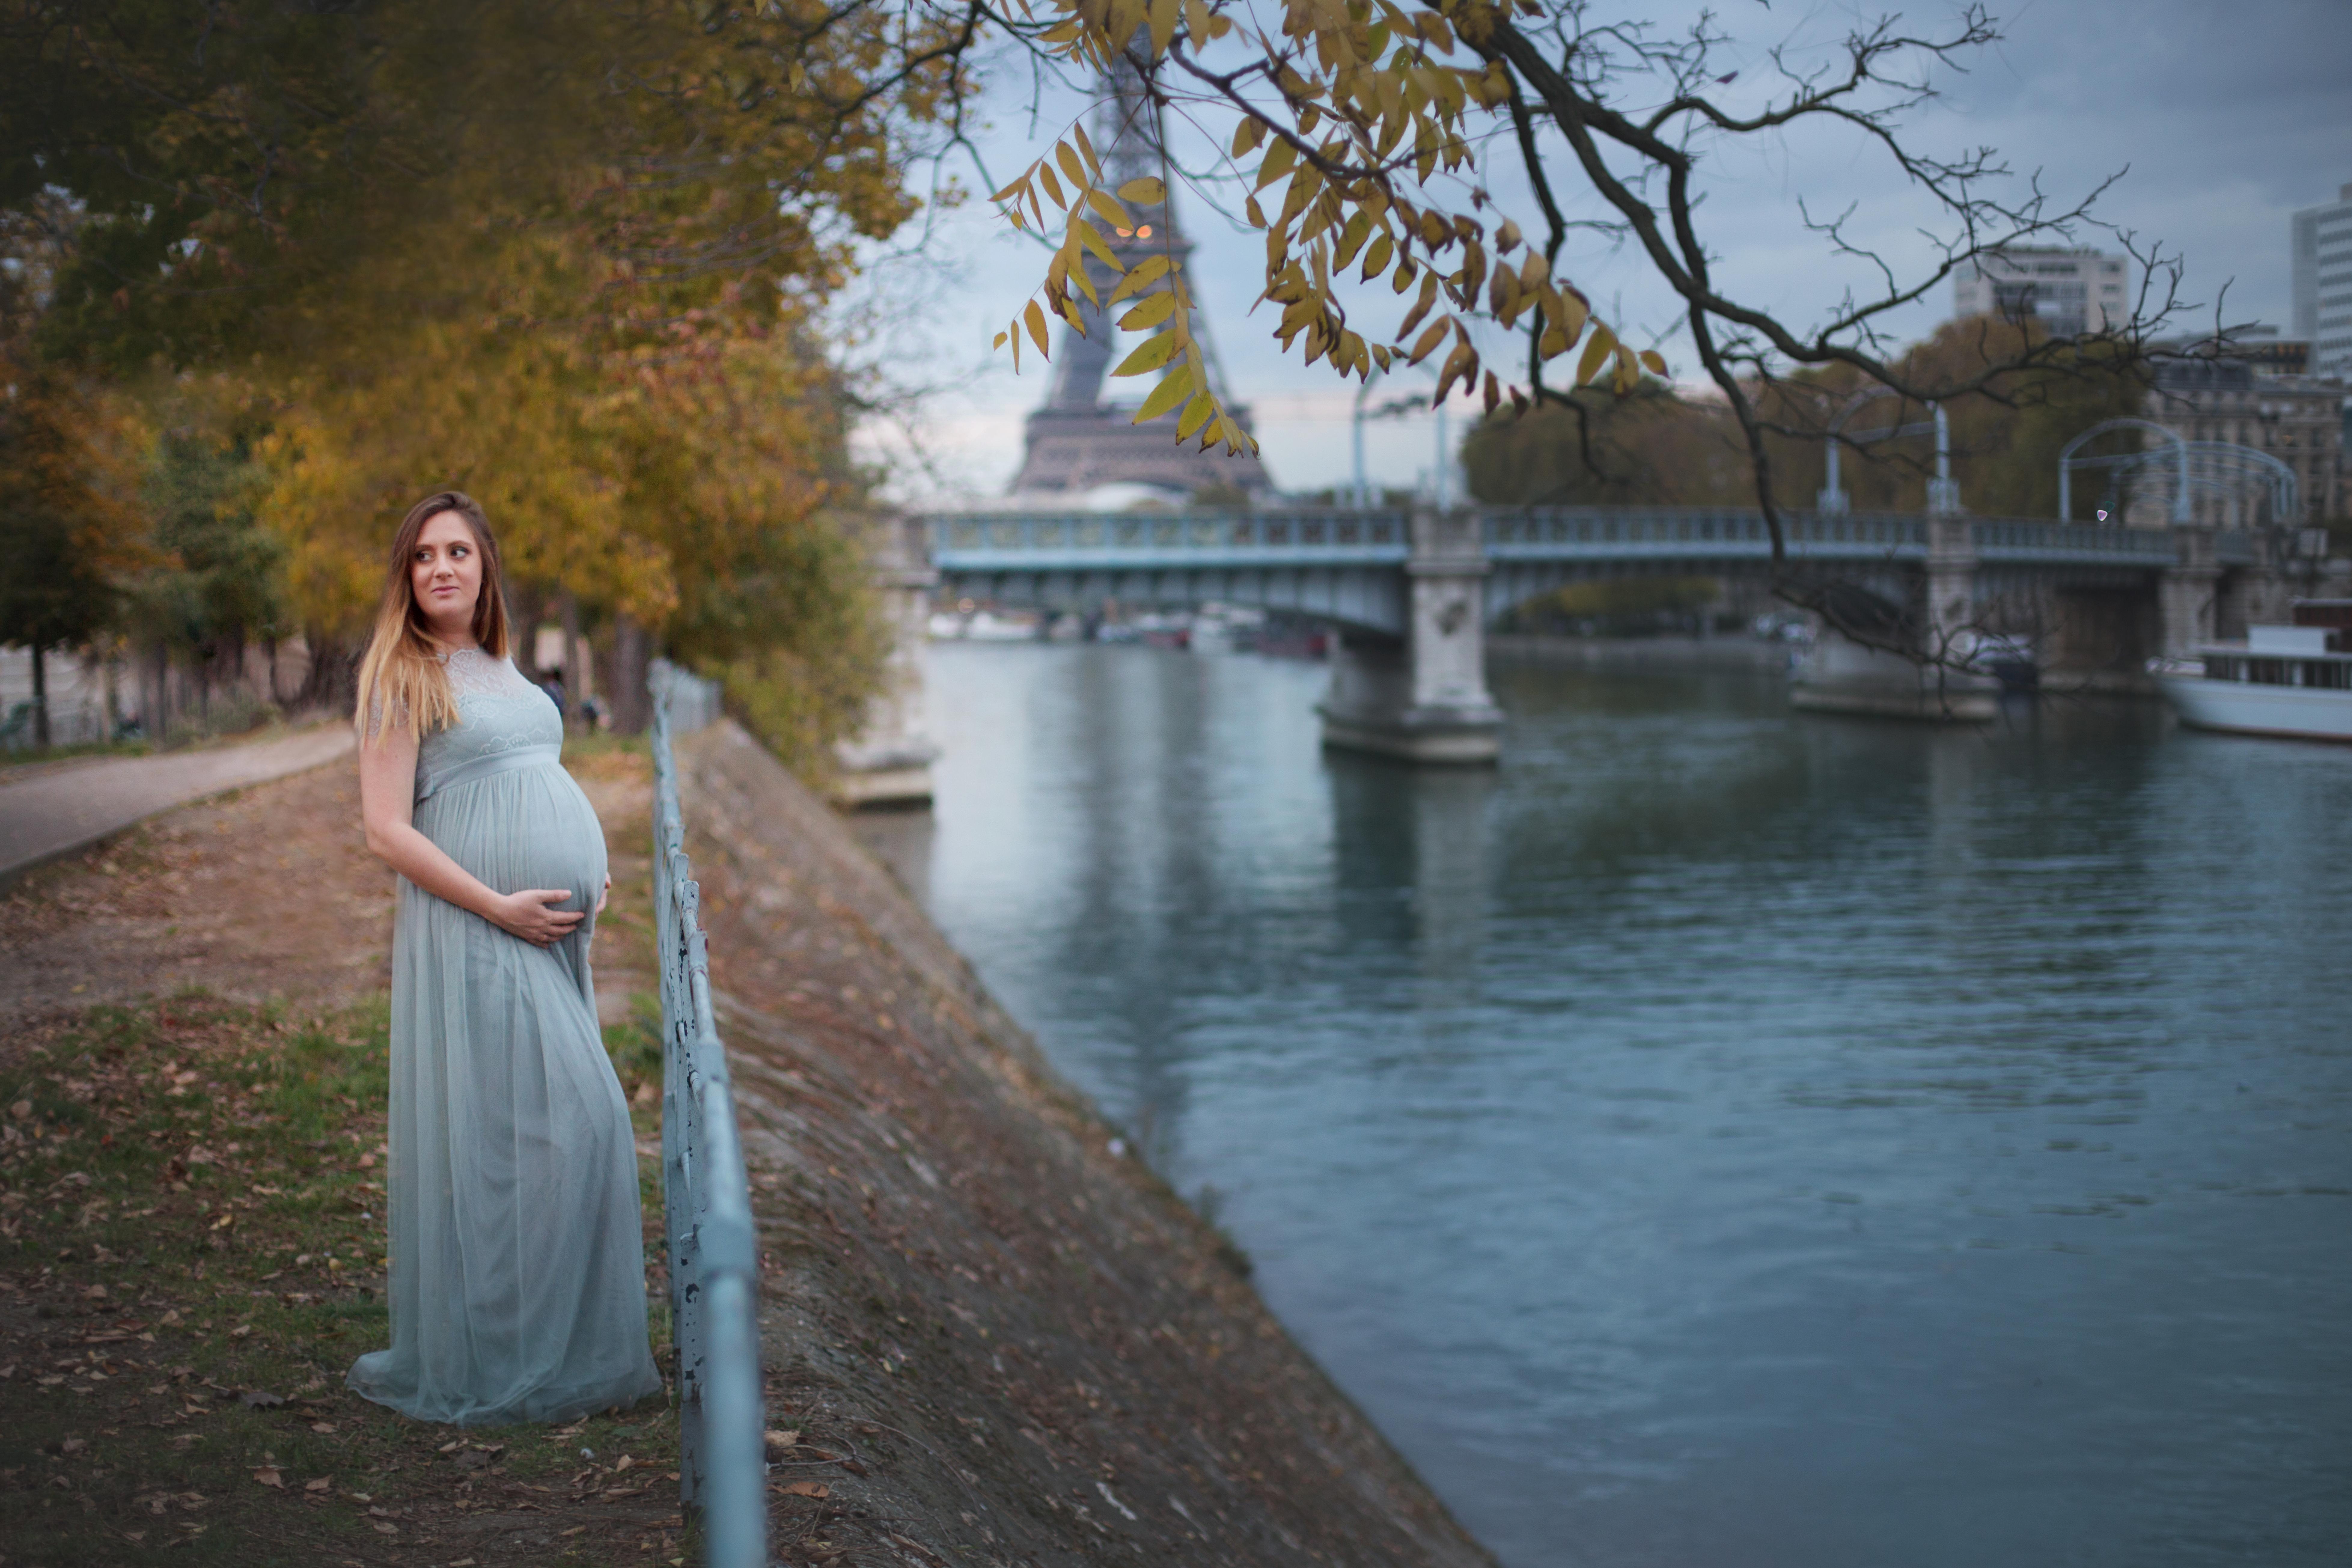 photographe-maternite-grossesse-seance-sur-mesure-personalisee-paris